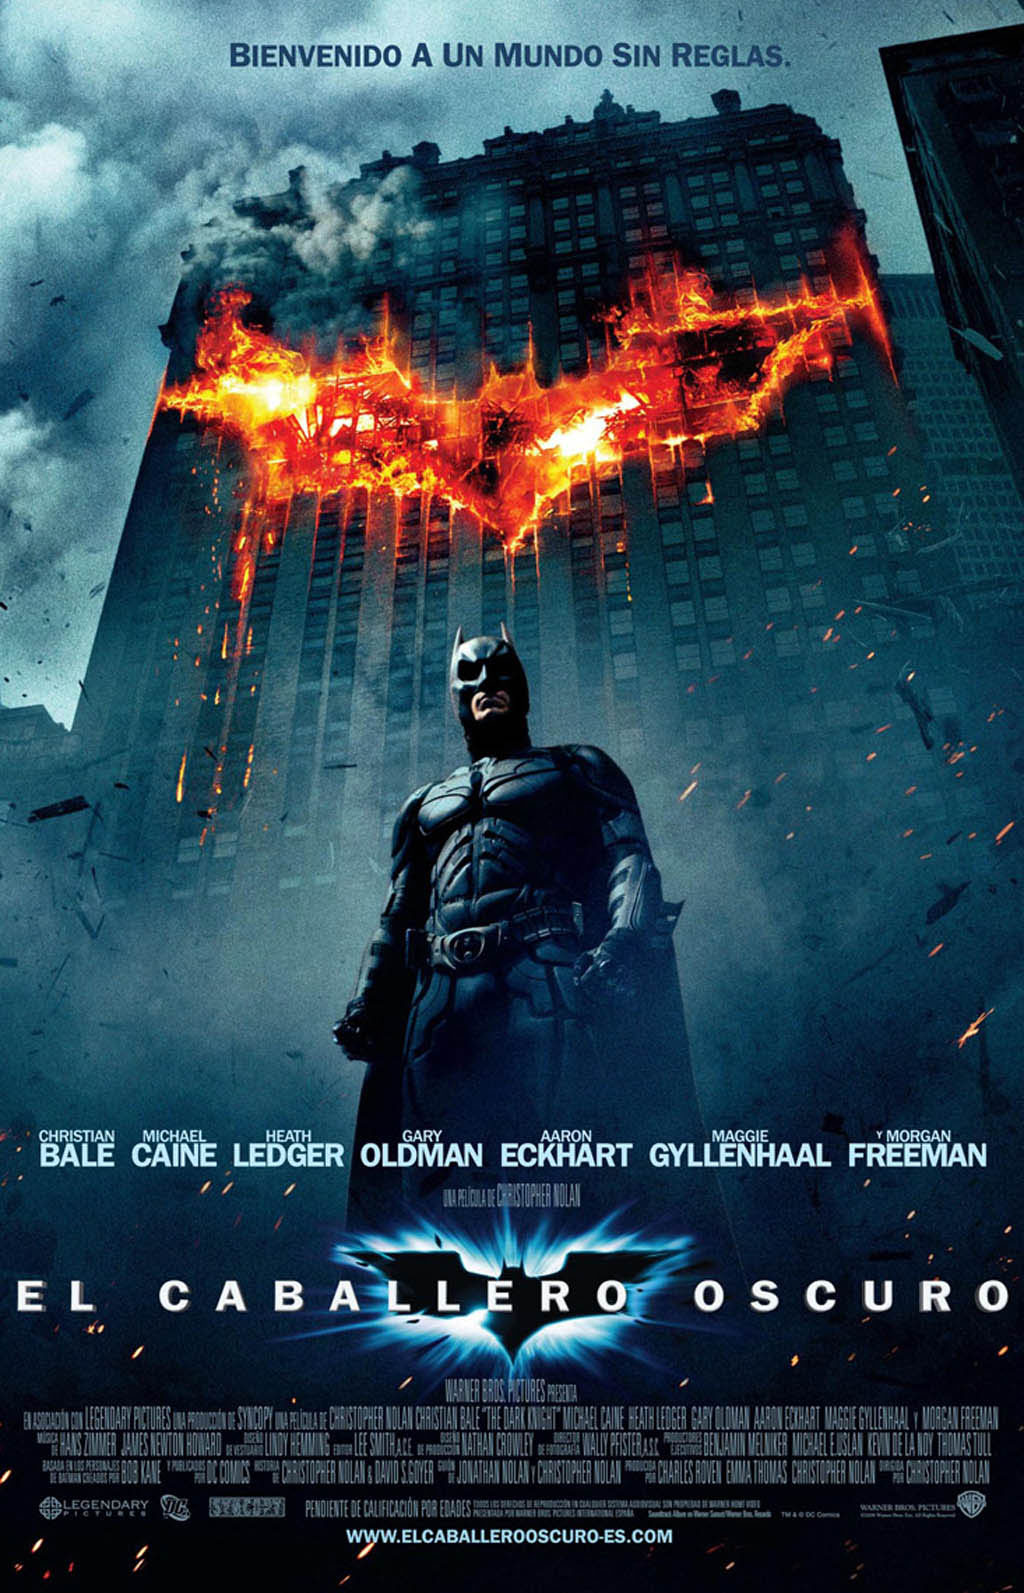 http://3.bp.blogspot.com/-6yTSG6sleSI/T_4bkxQNQOI/AAAAAAAACjg/3lb0ojf7q2g/s1600/El_Caballero_Oscuro-Cartel1.jpg